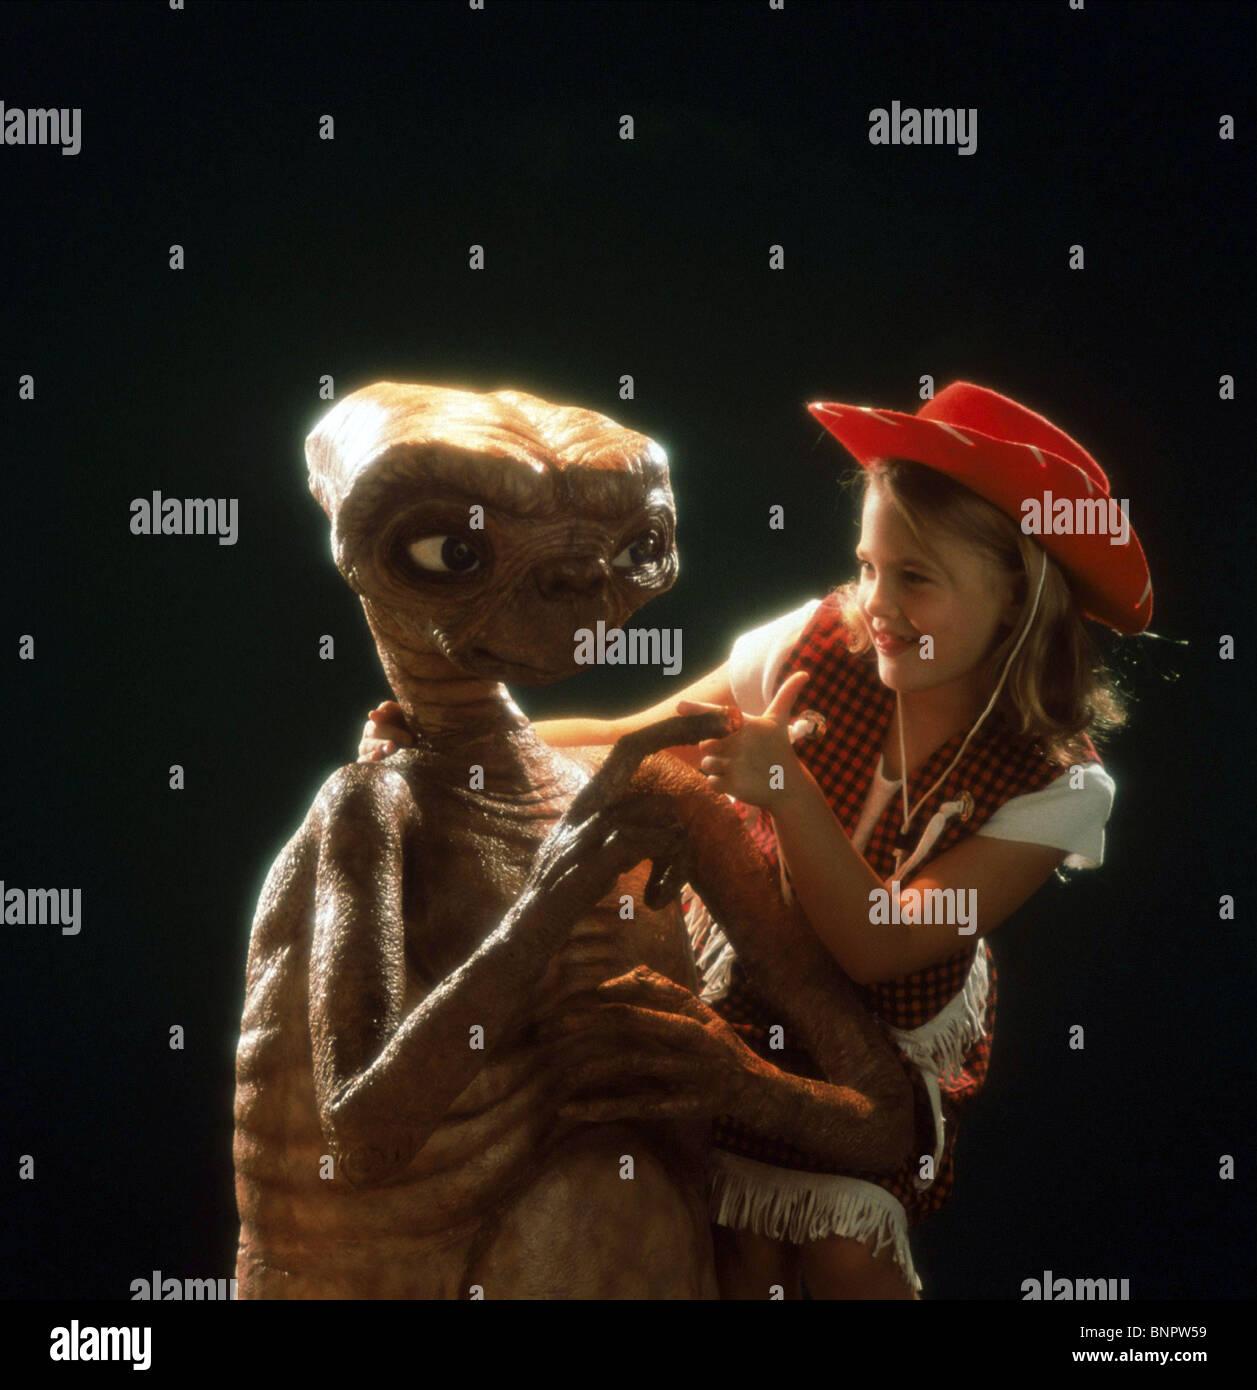 Alien Drew Barrymore E T The Extra Terrestrial 1982 Stock Photo Alamy